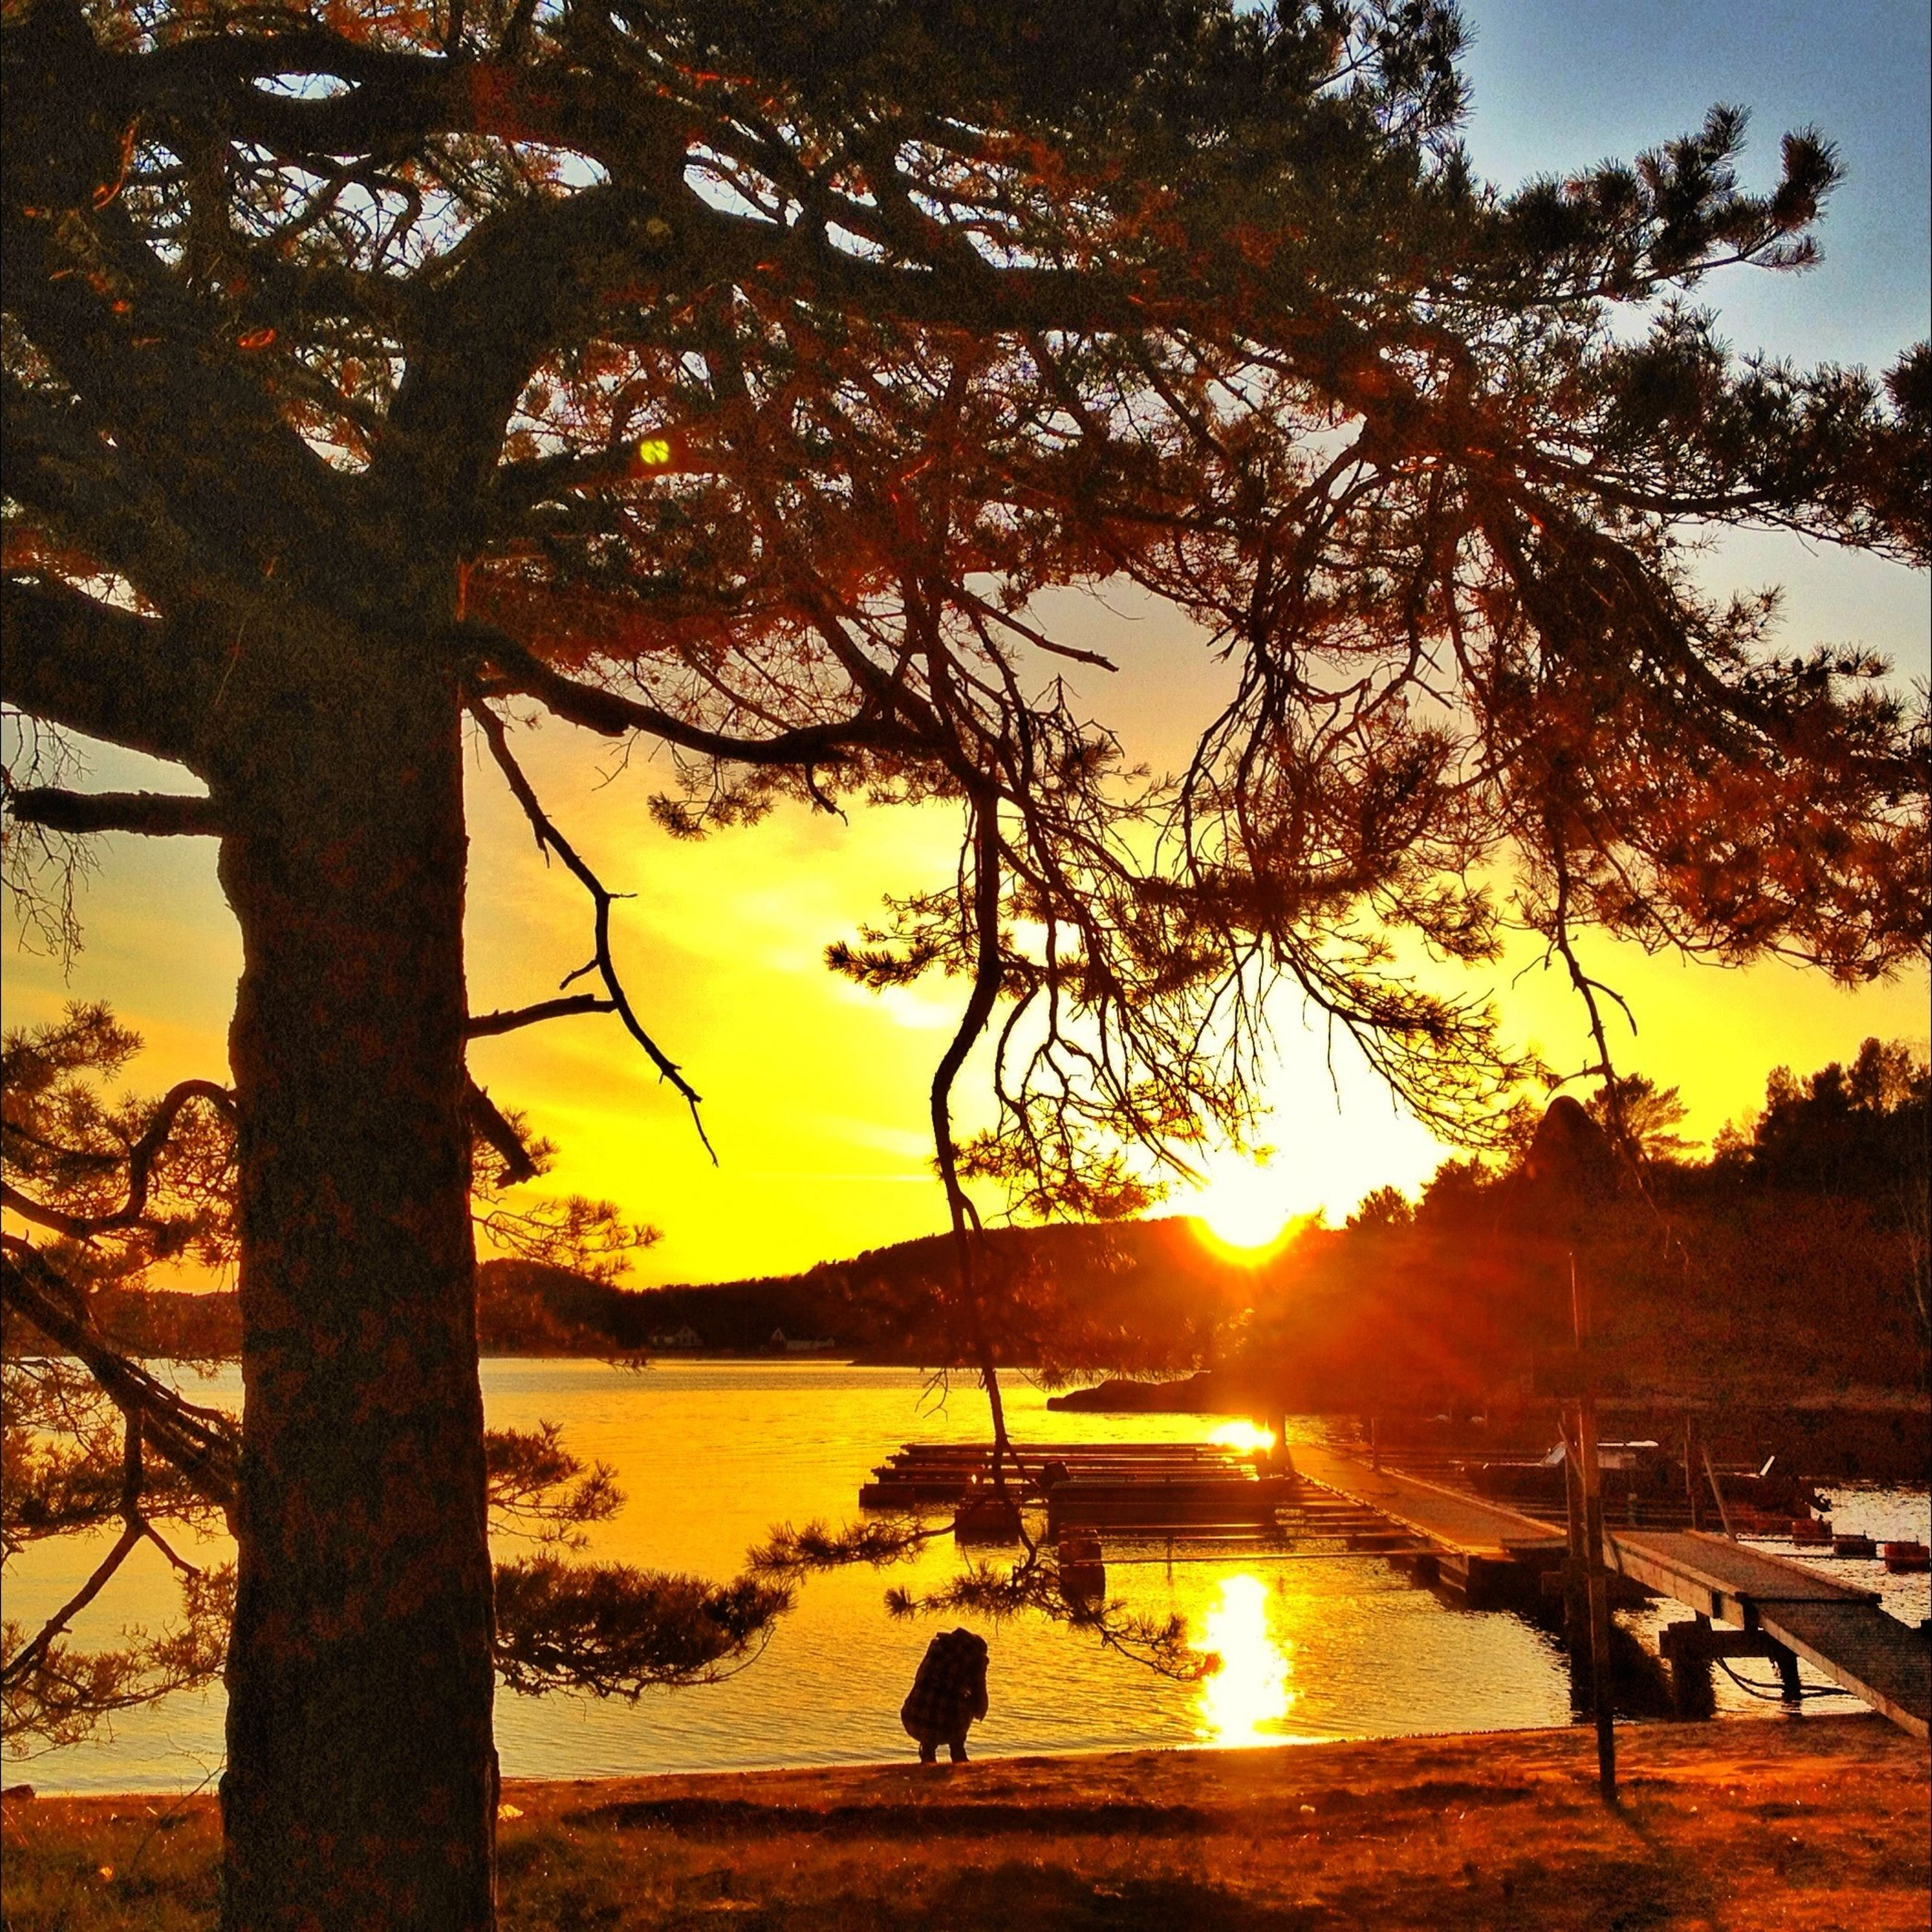 sunset, sun, water, silhouette, orange color, scenics, beauty in nature, tree, tranquility, tranquil scene, nature, sky, sunlight, nautical vessel, sea, idyllic, lake, reflection, transportation, mode of transport